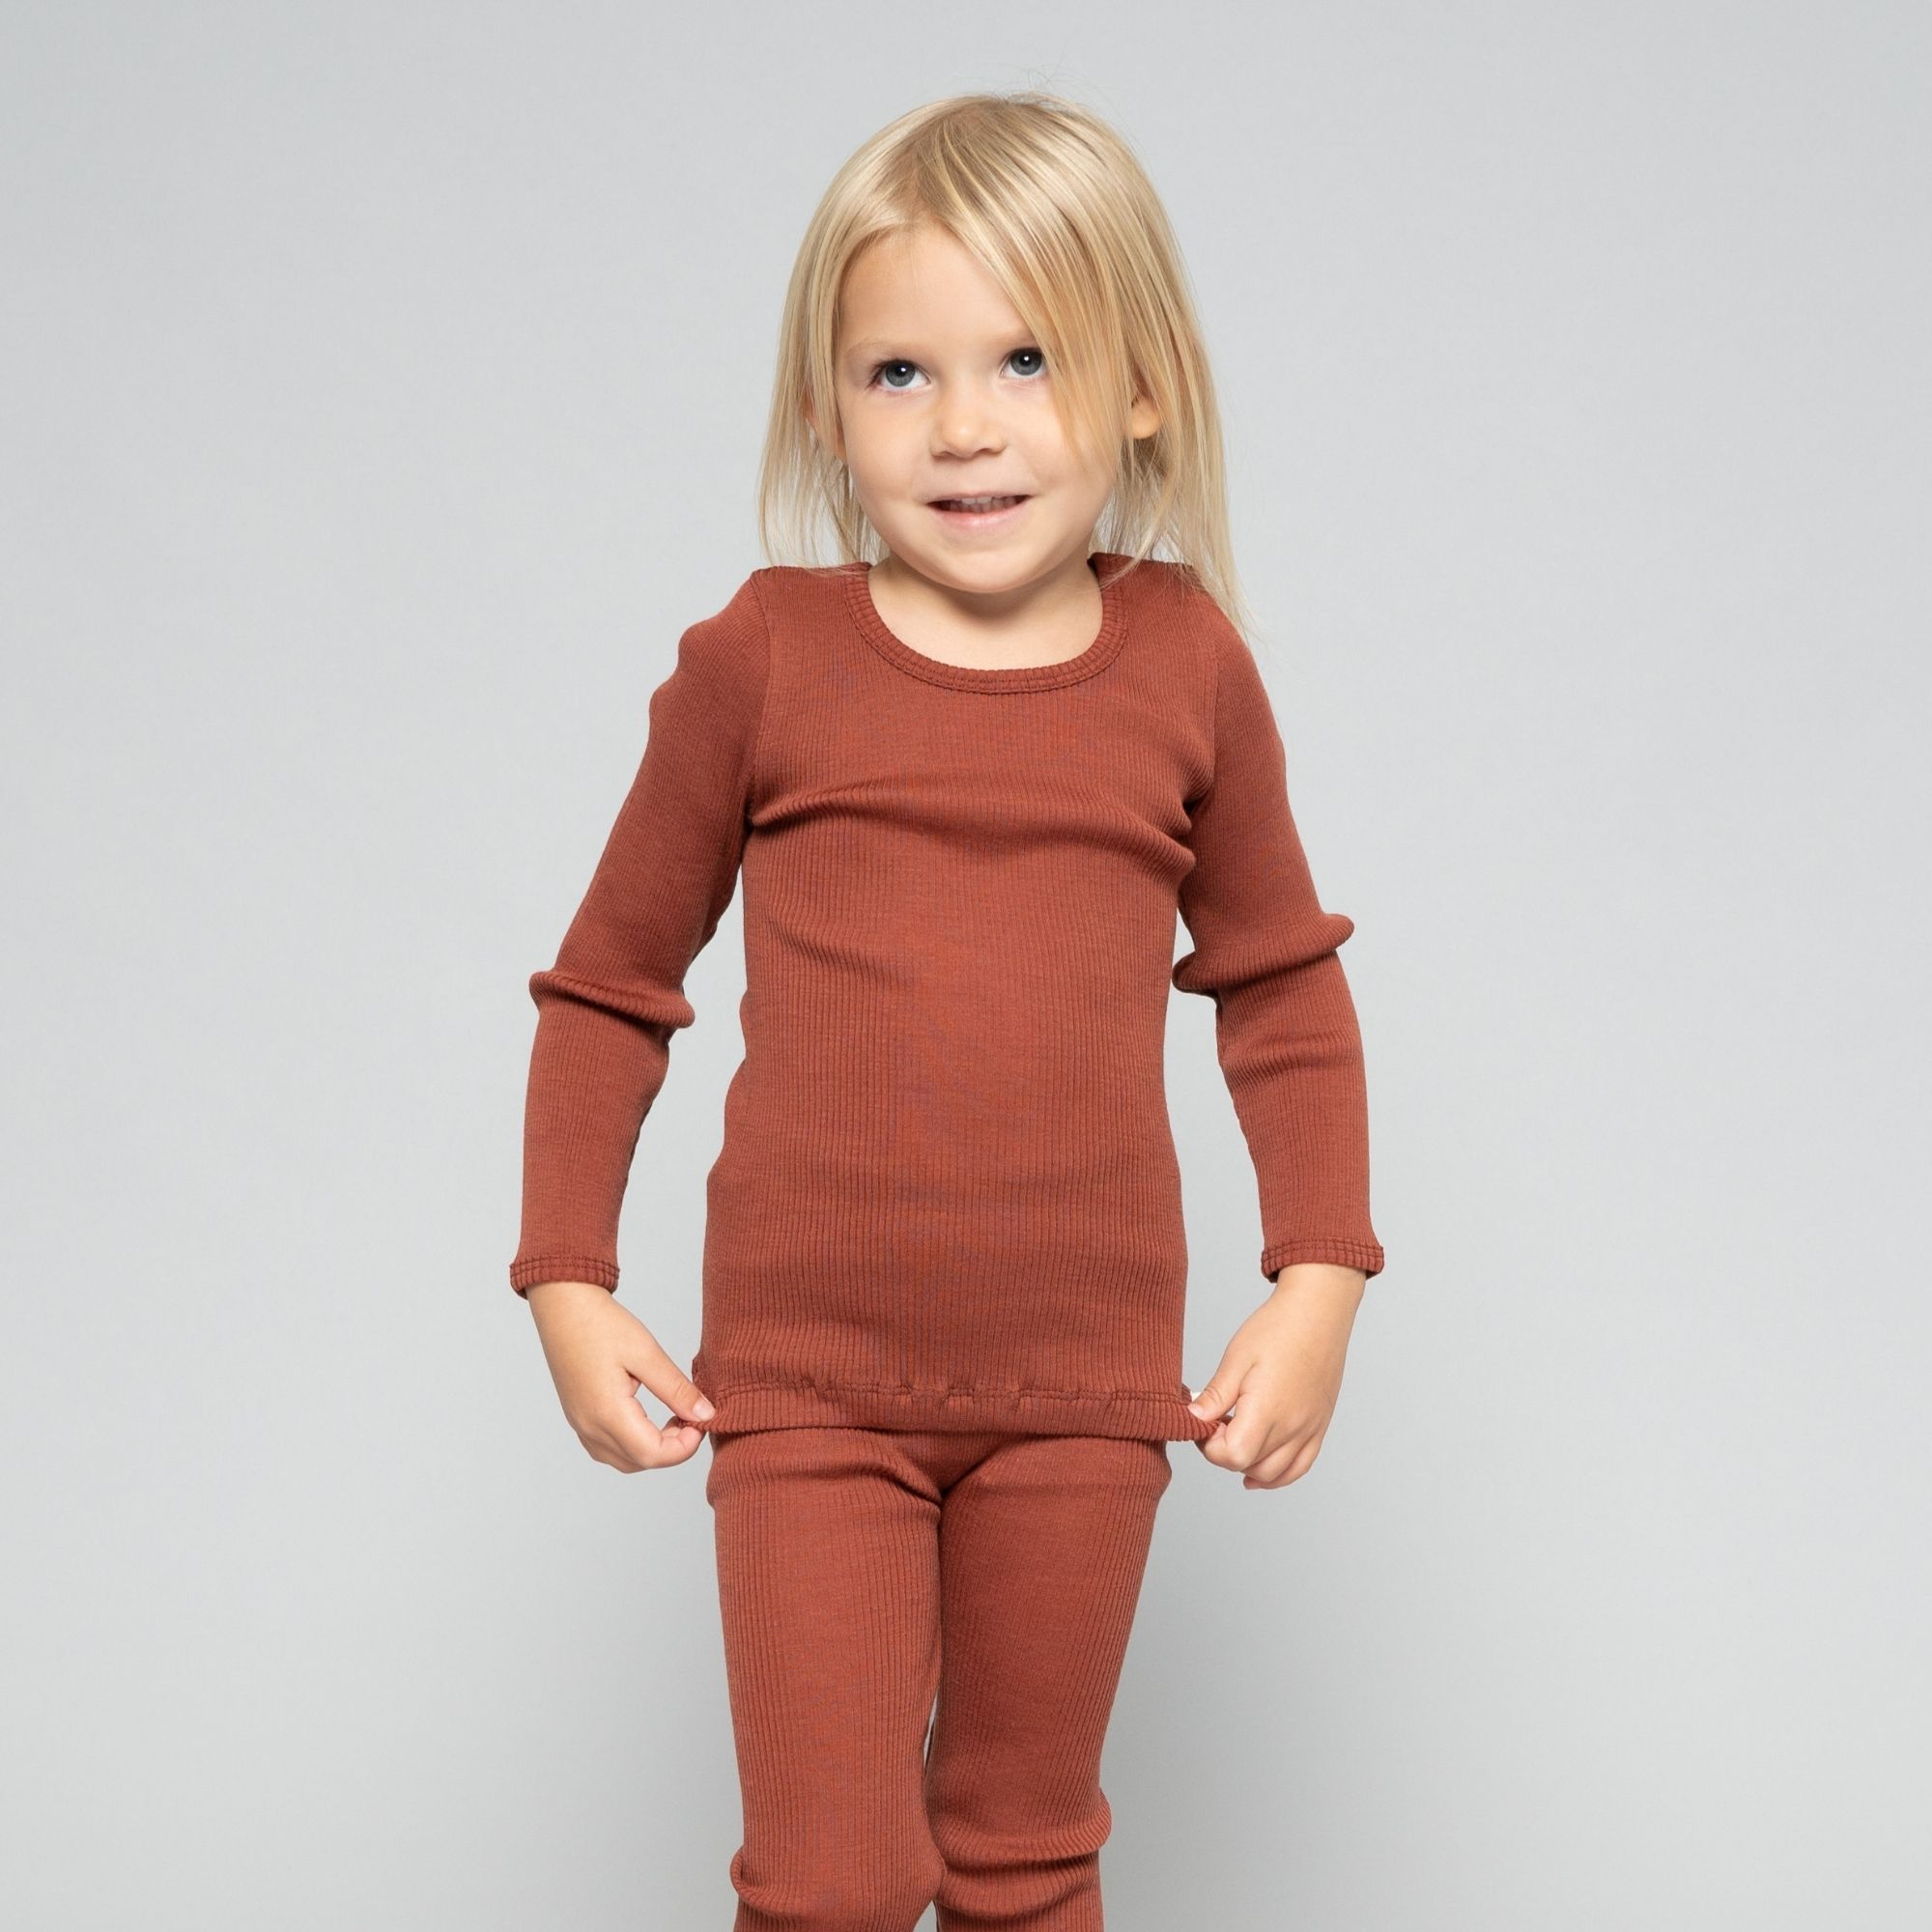 MINIMALISMA - T-shirt enfant - 100 % laine mérinos - Rhubarbe